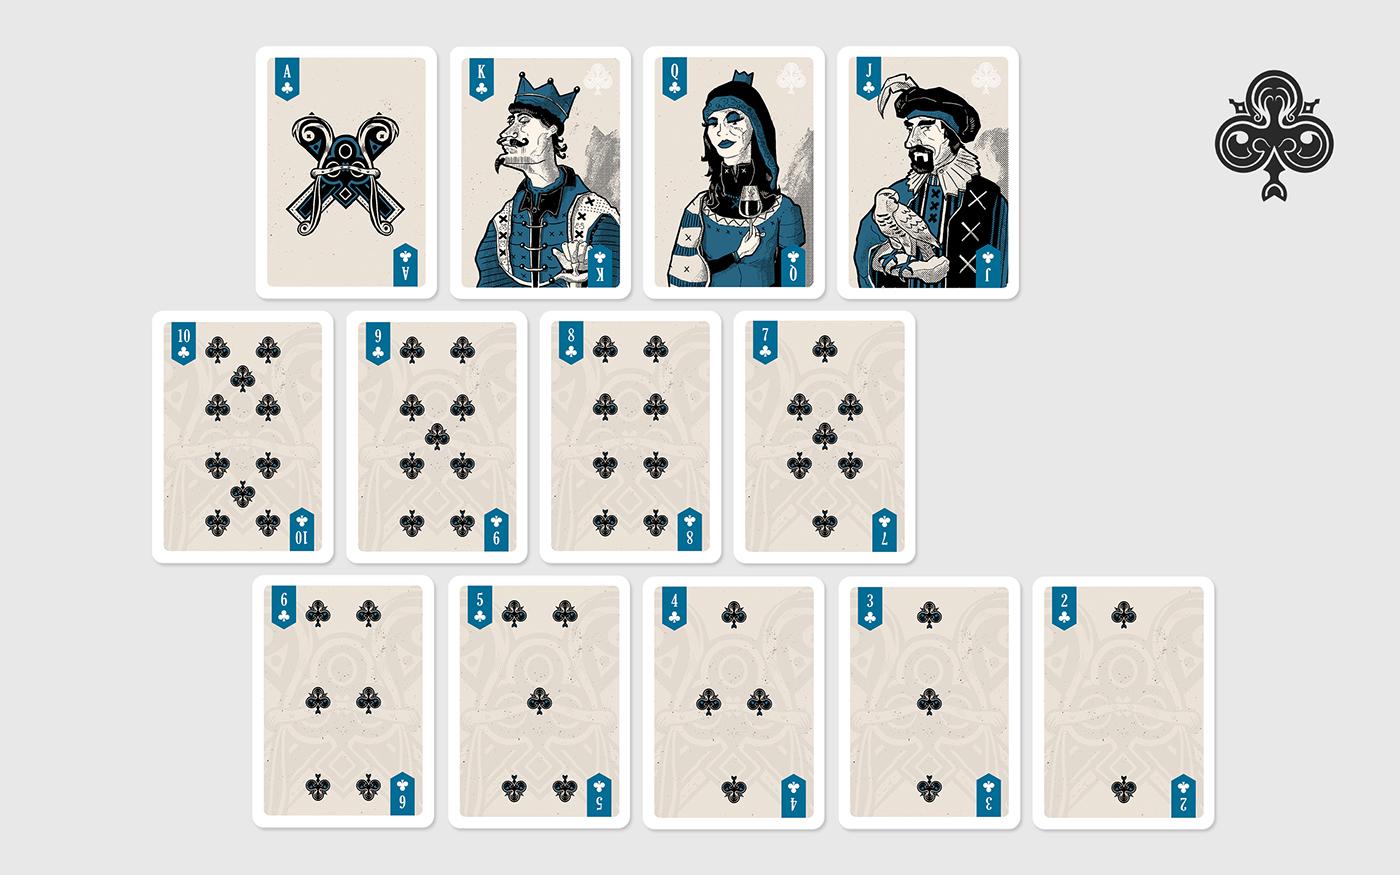 Ways to win in poker